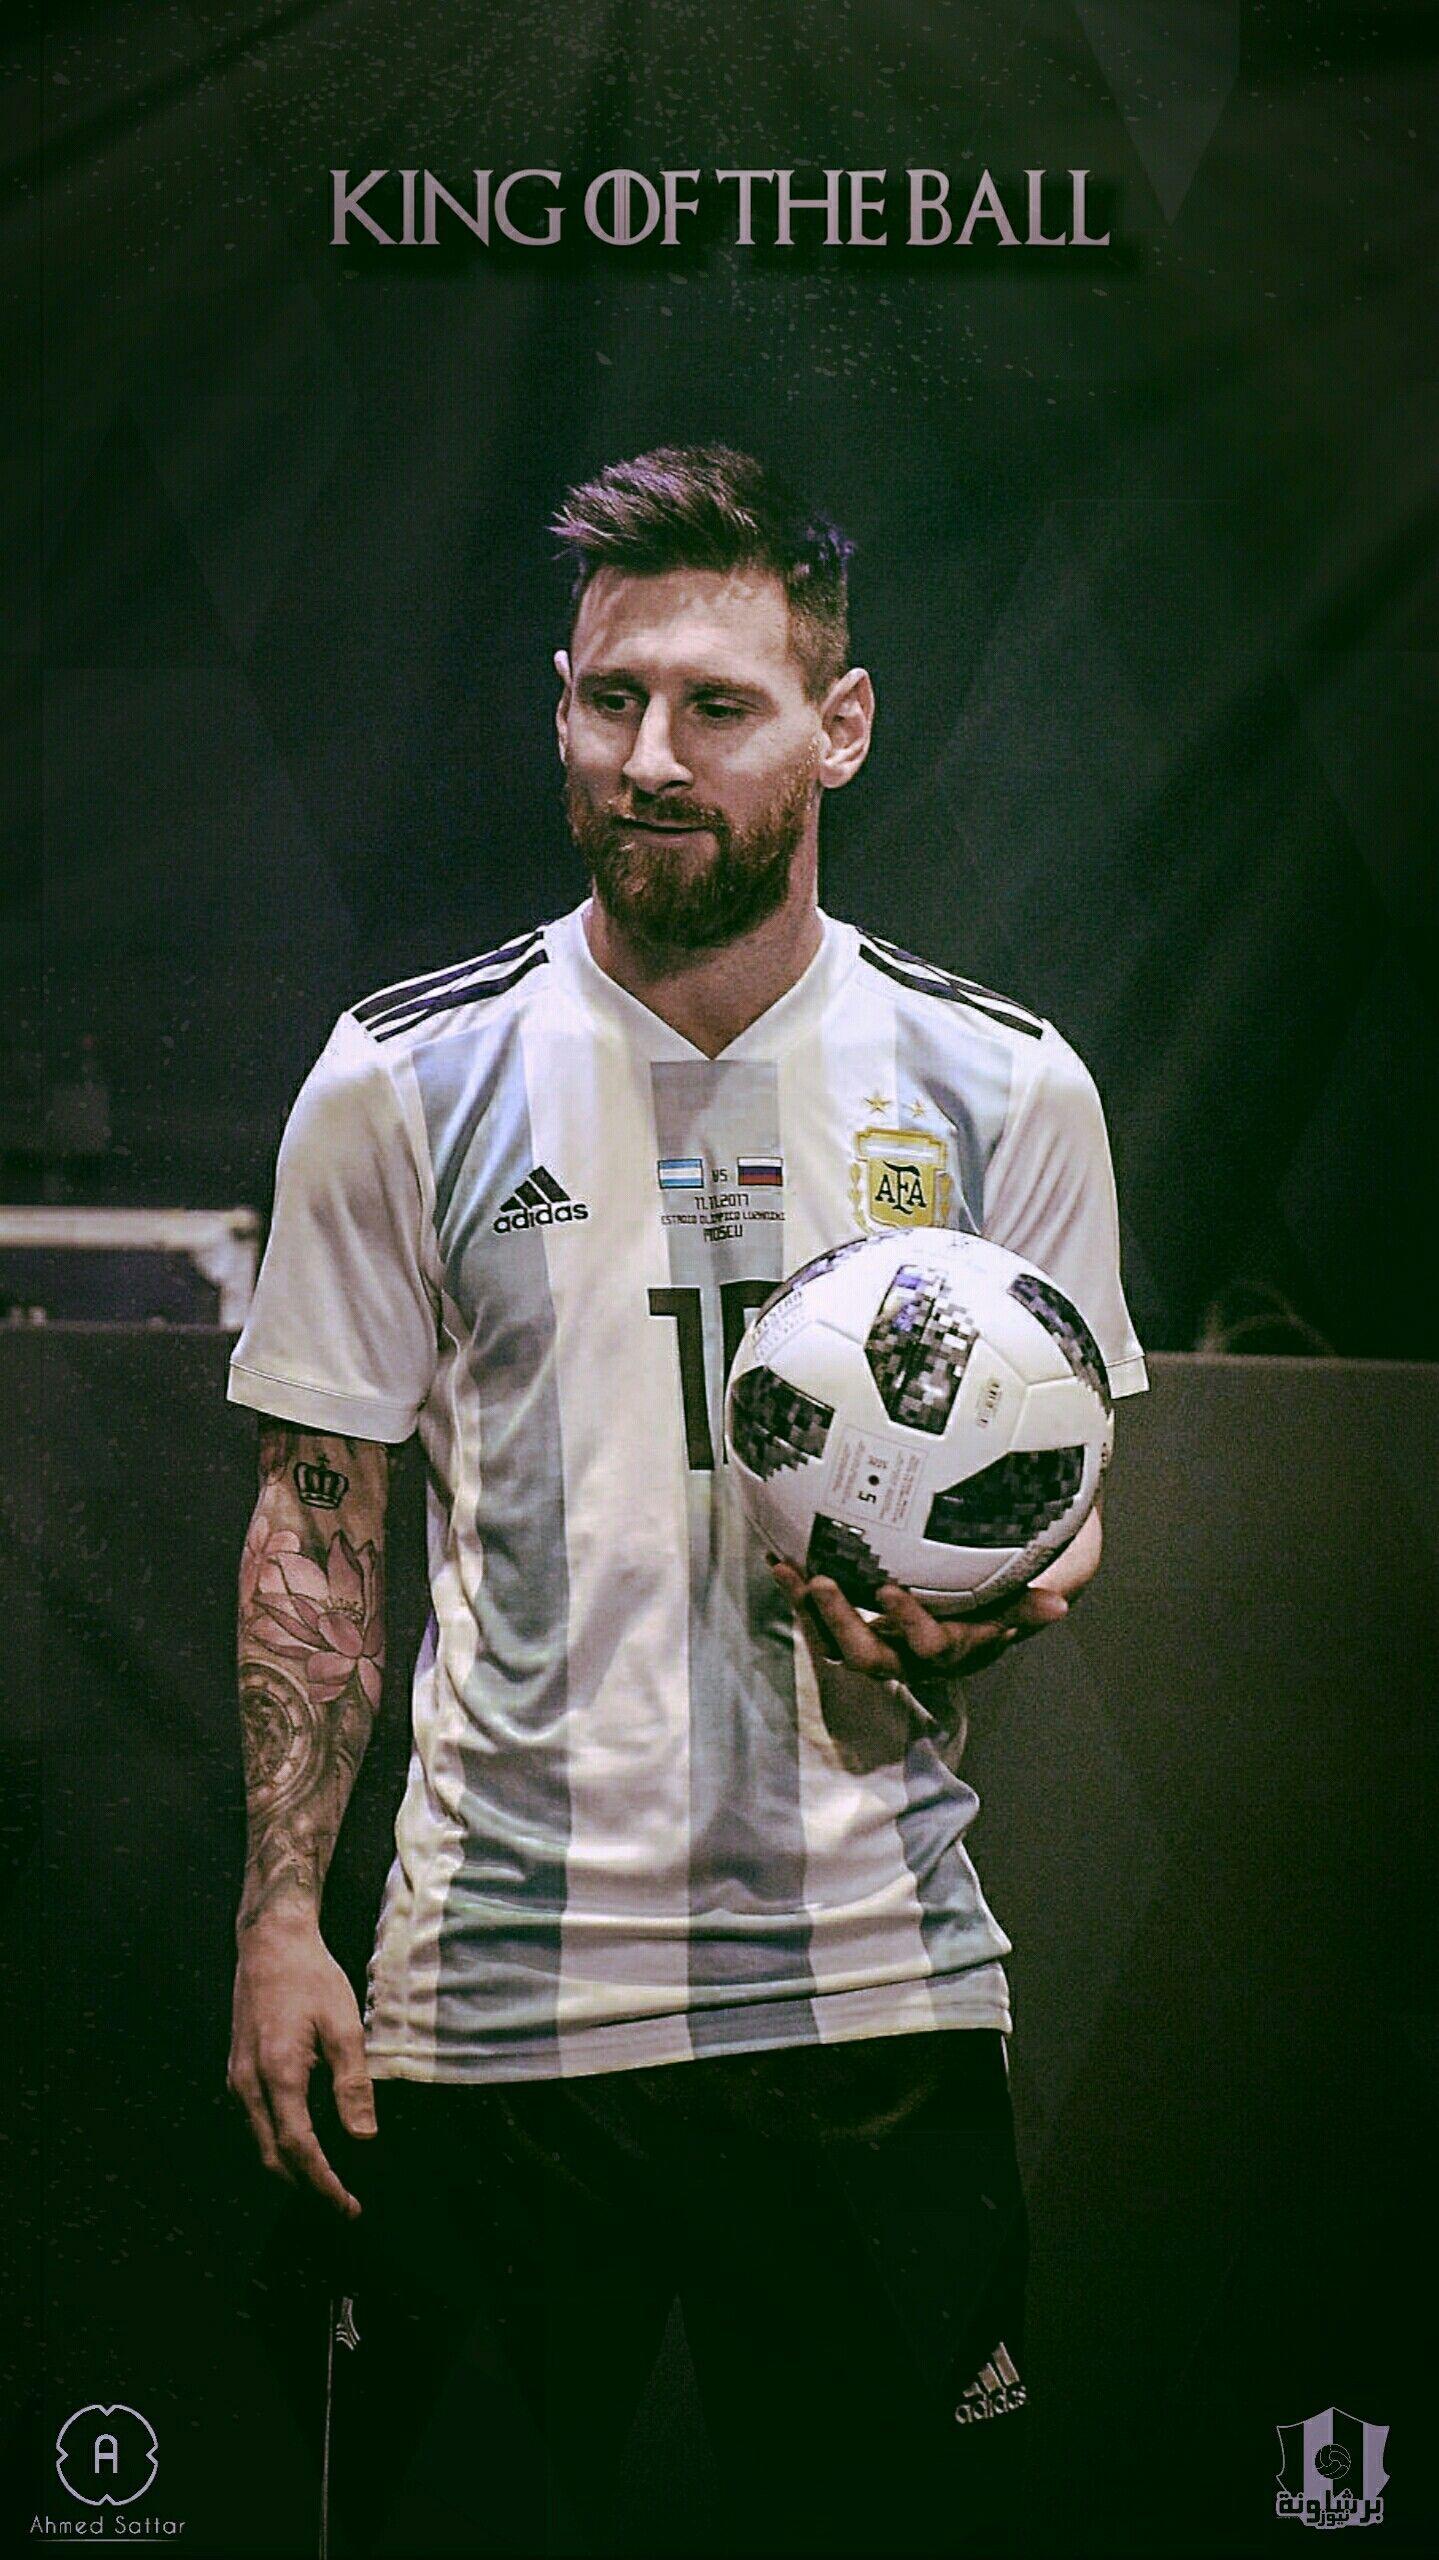 Wifi Repeater Leonel Messi Messi Argentina Fotos De Messi